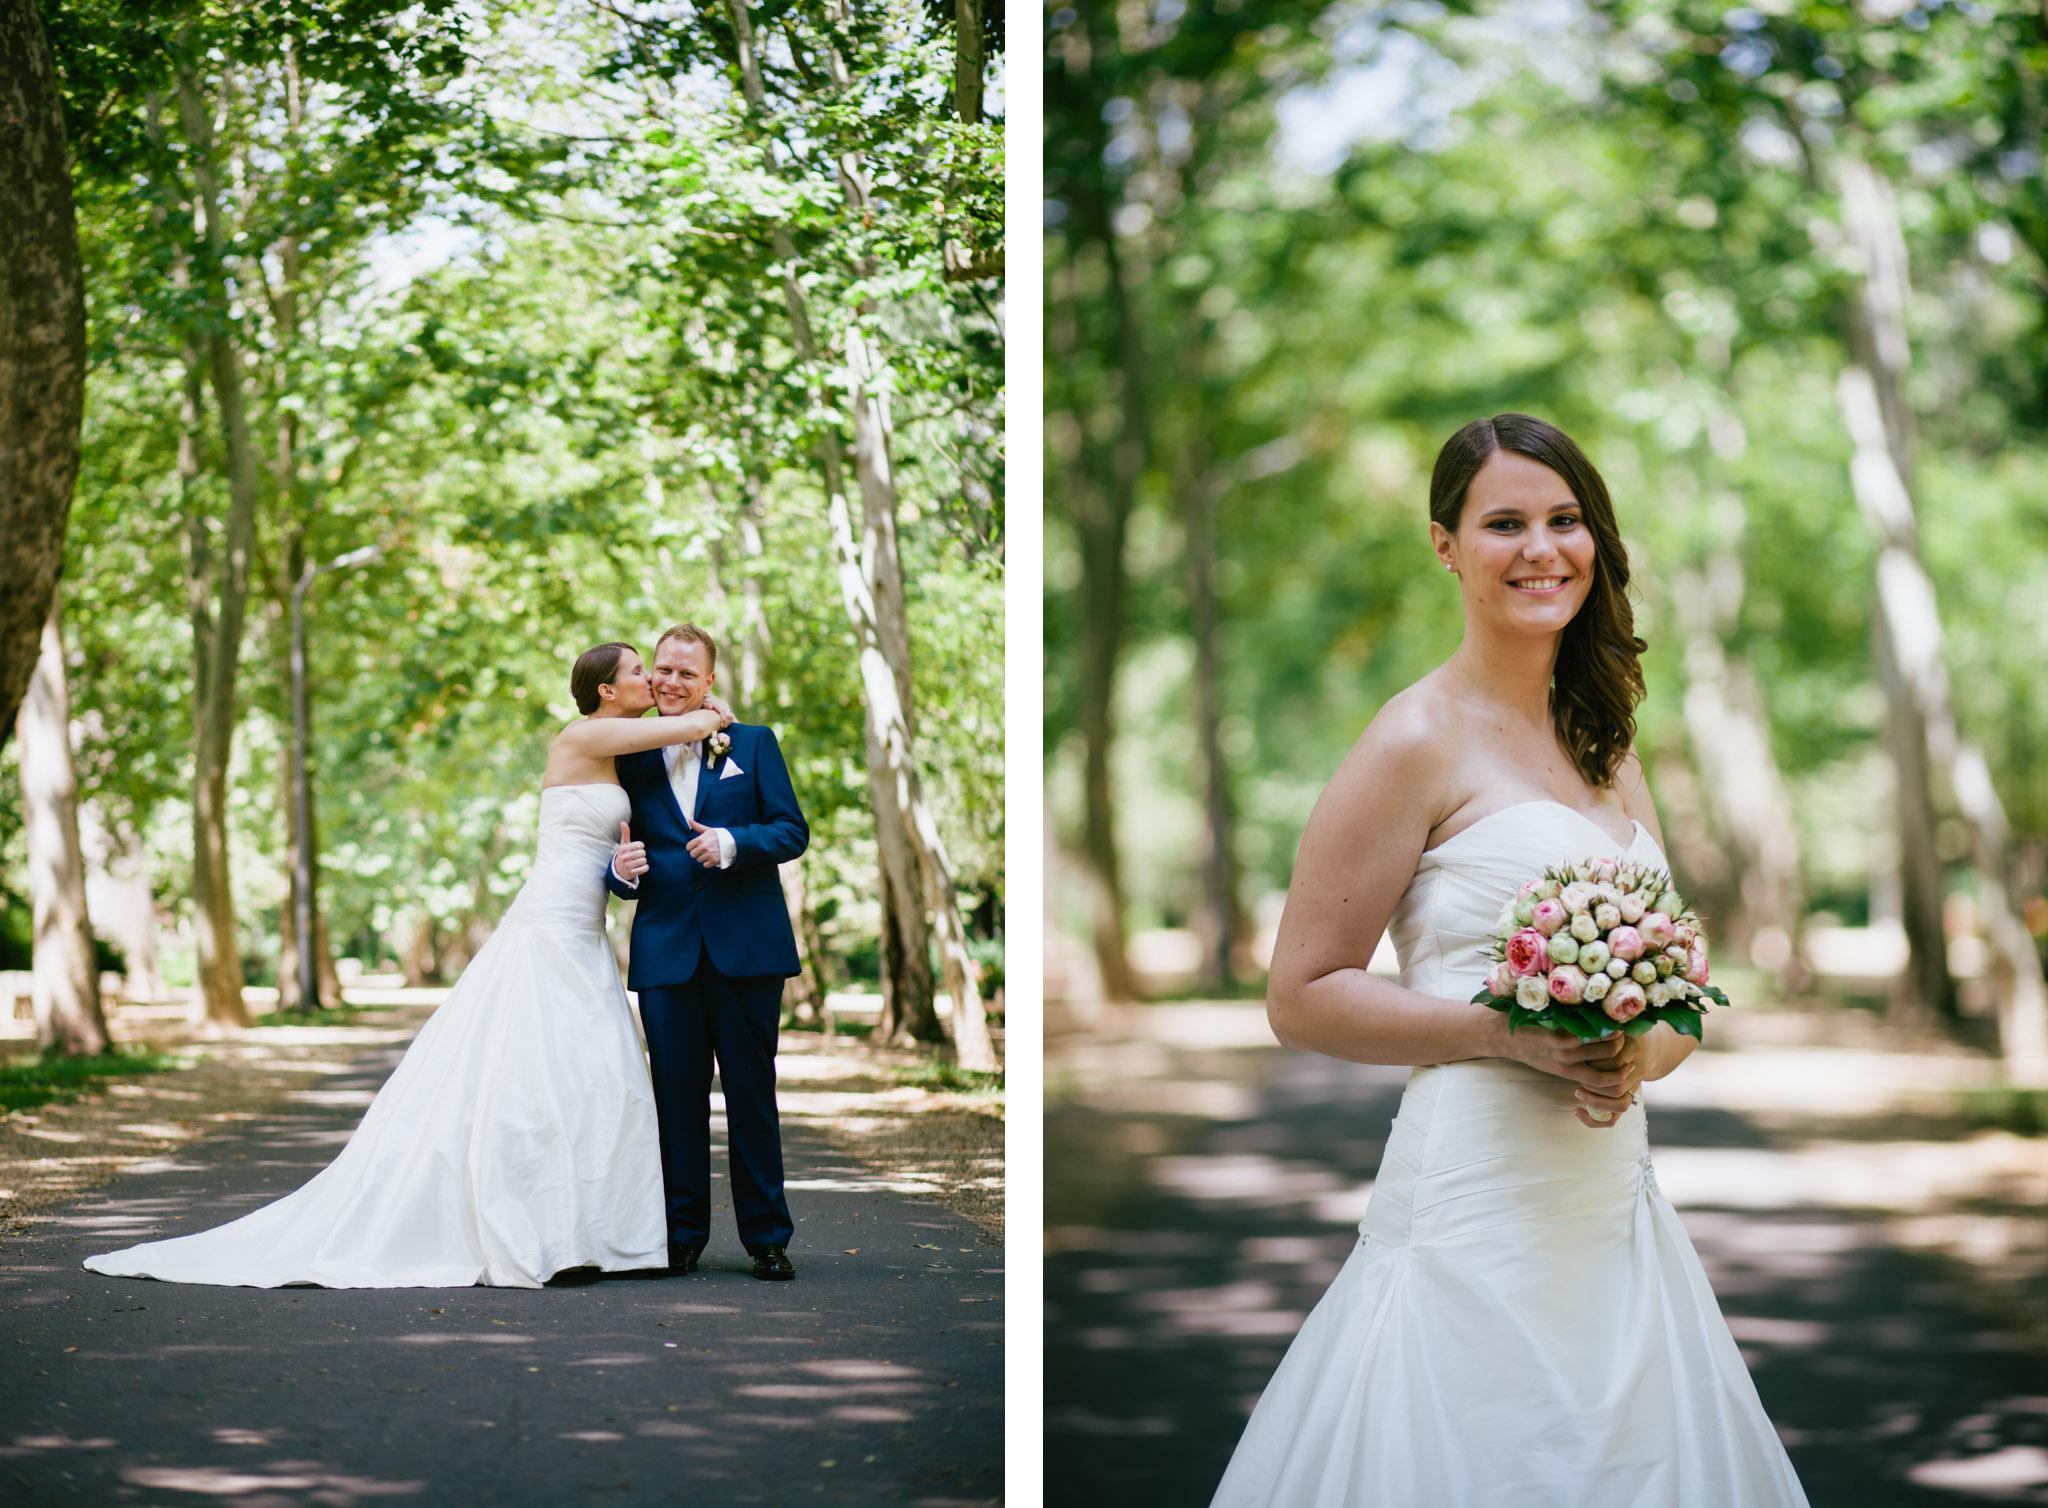 eskuvo_fotozas_wedding_foto_lenart_gabor_sztyui_budapest_IMG_1328